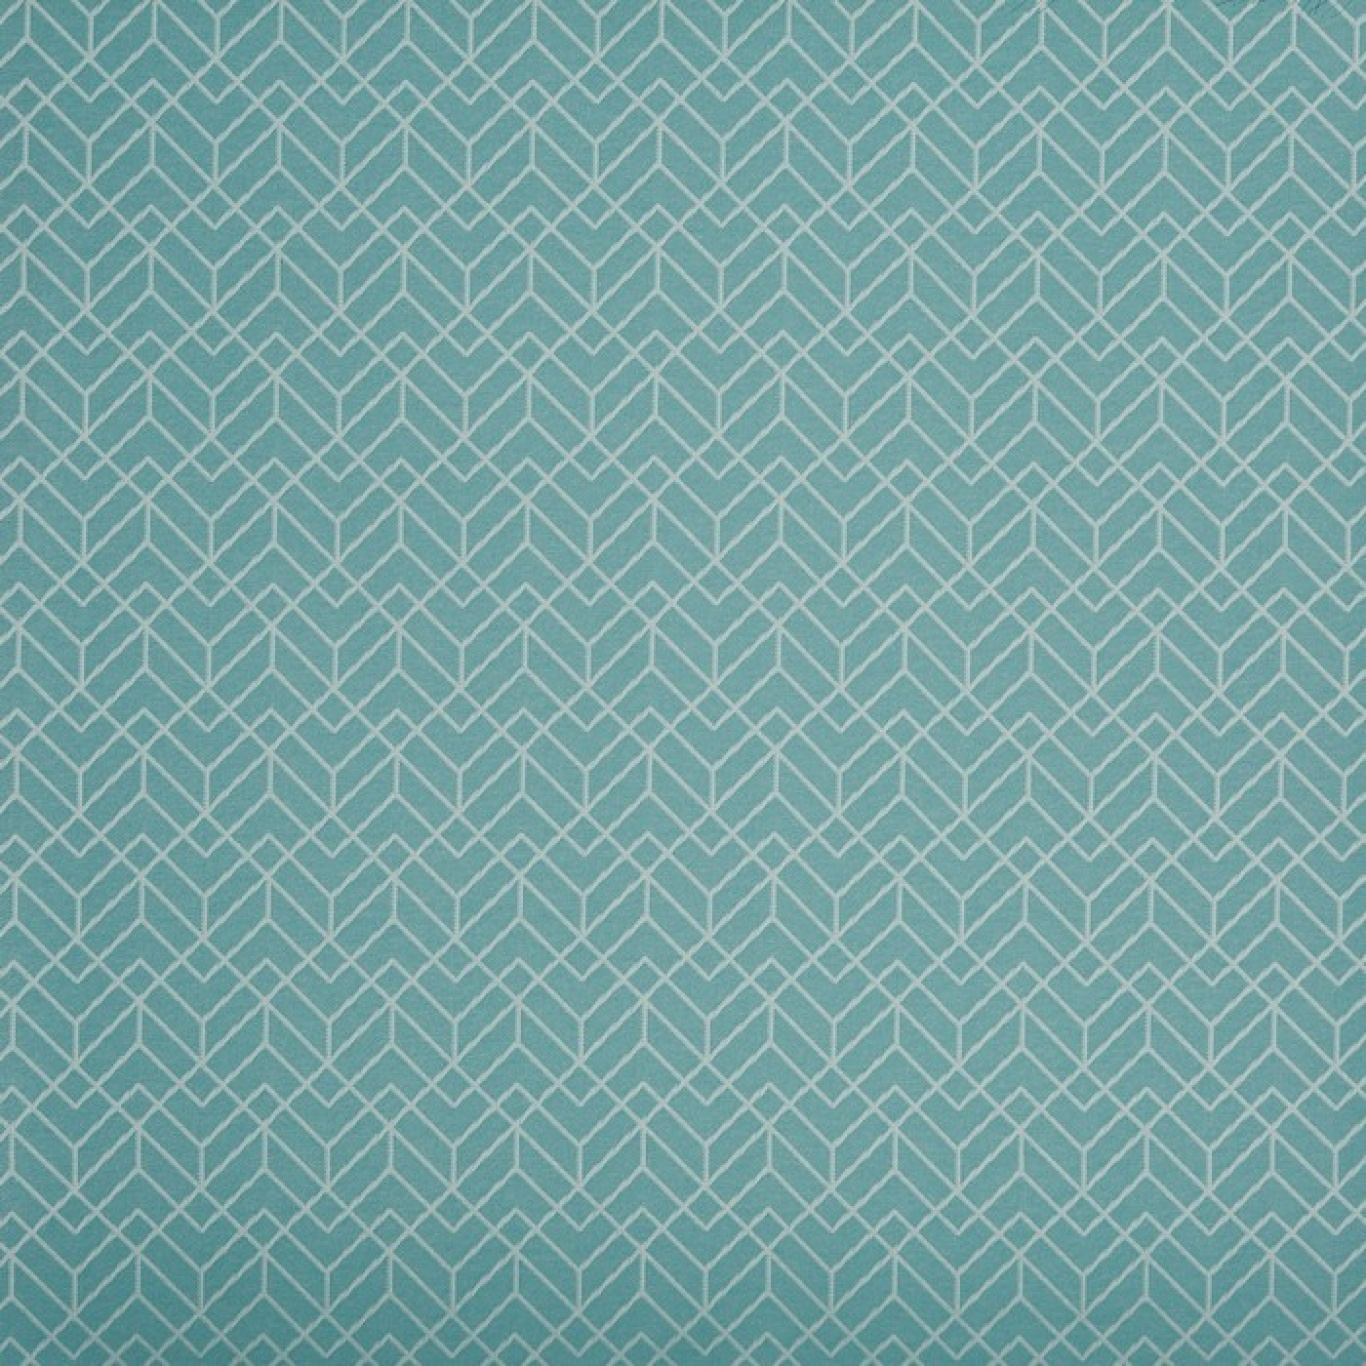 Image of Prestigious Penrose Marine FR Fabric 2019/721